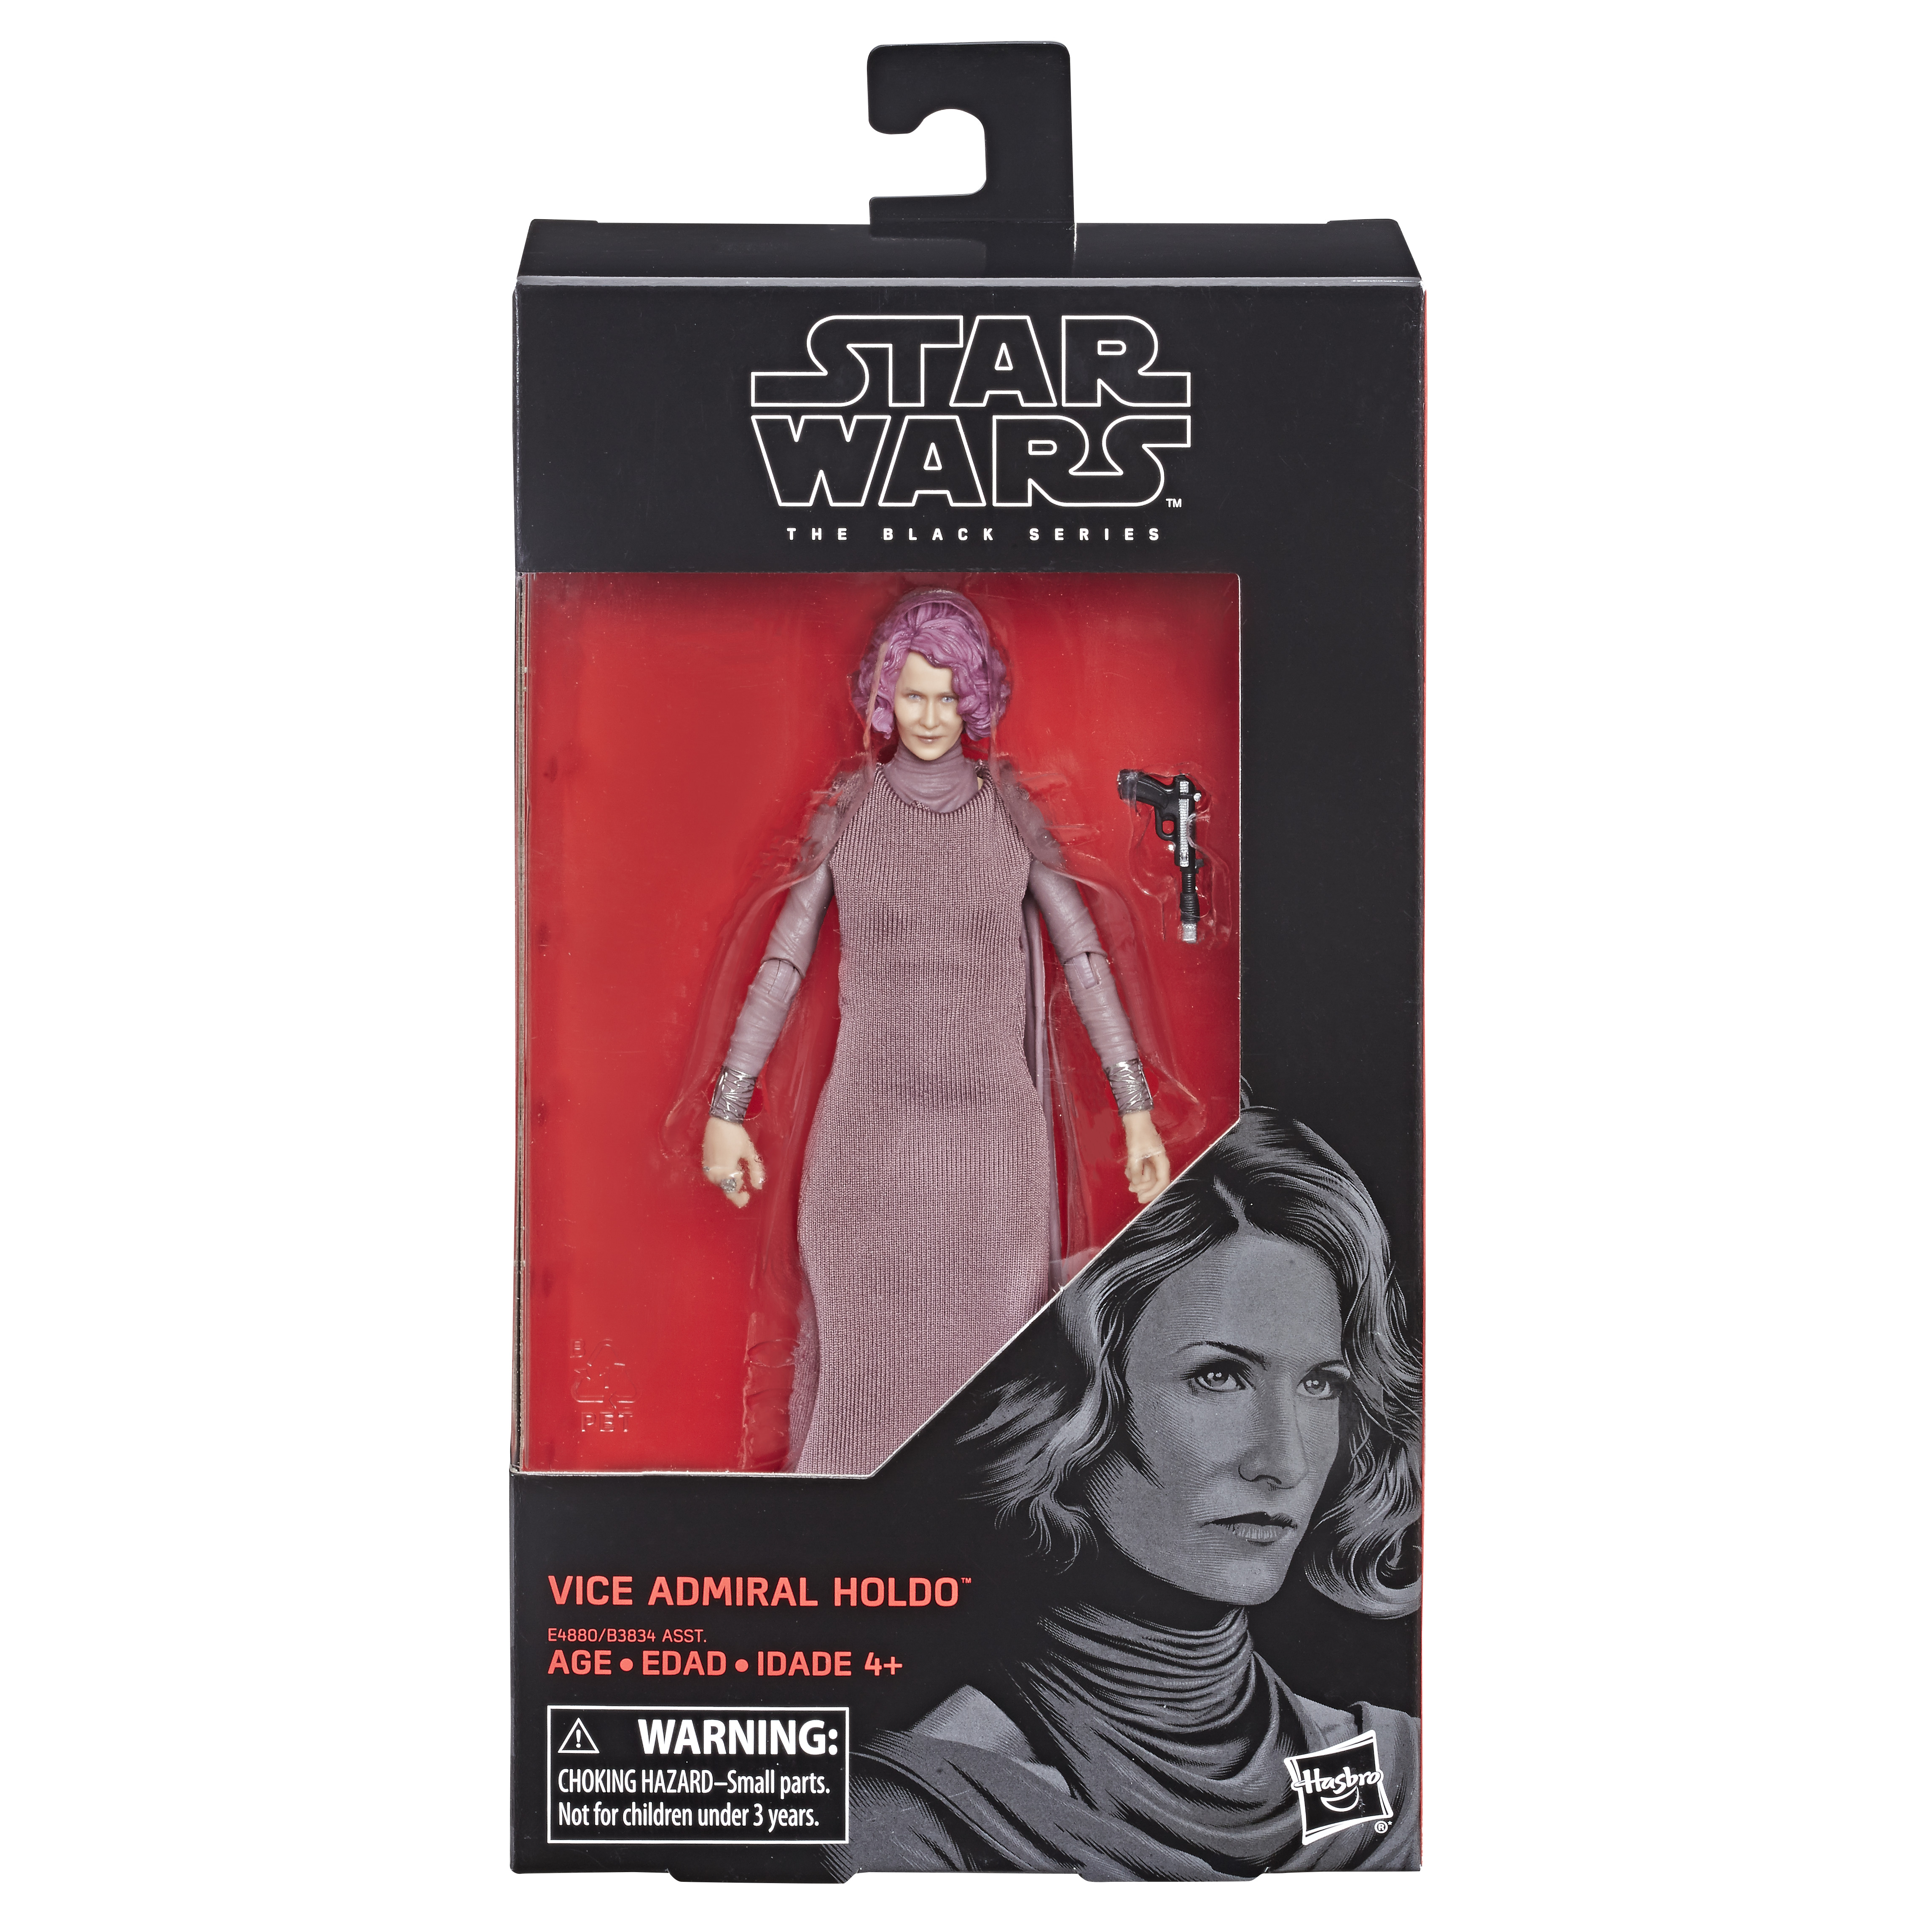 Star Wars The Black Series Vice Admiral Holdo 15cm E4880 5010993568055